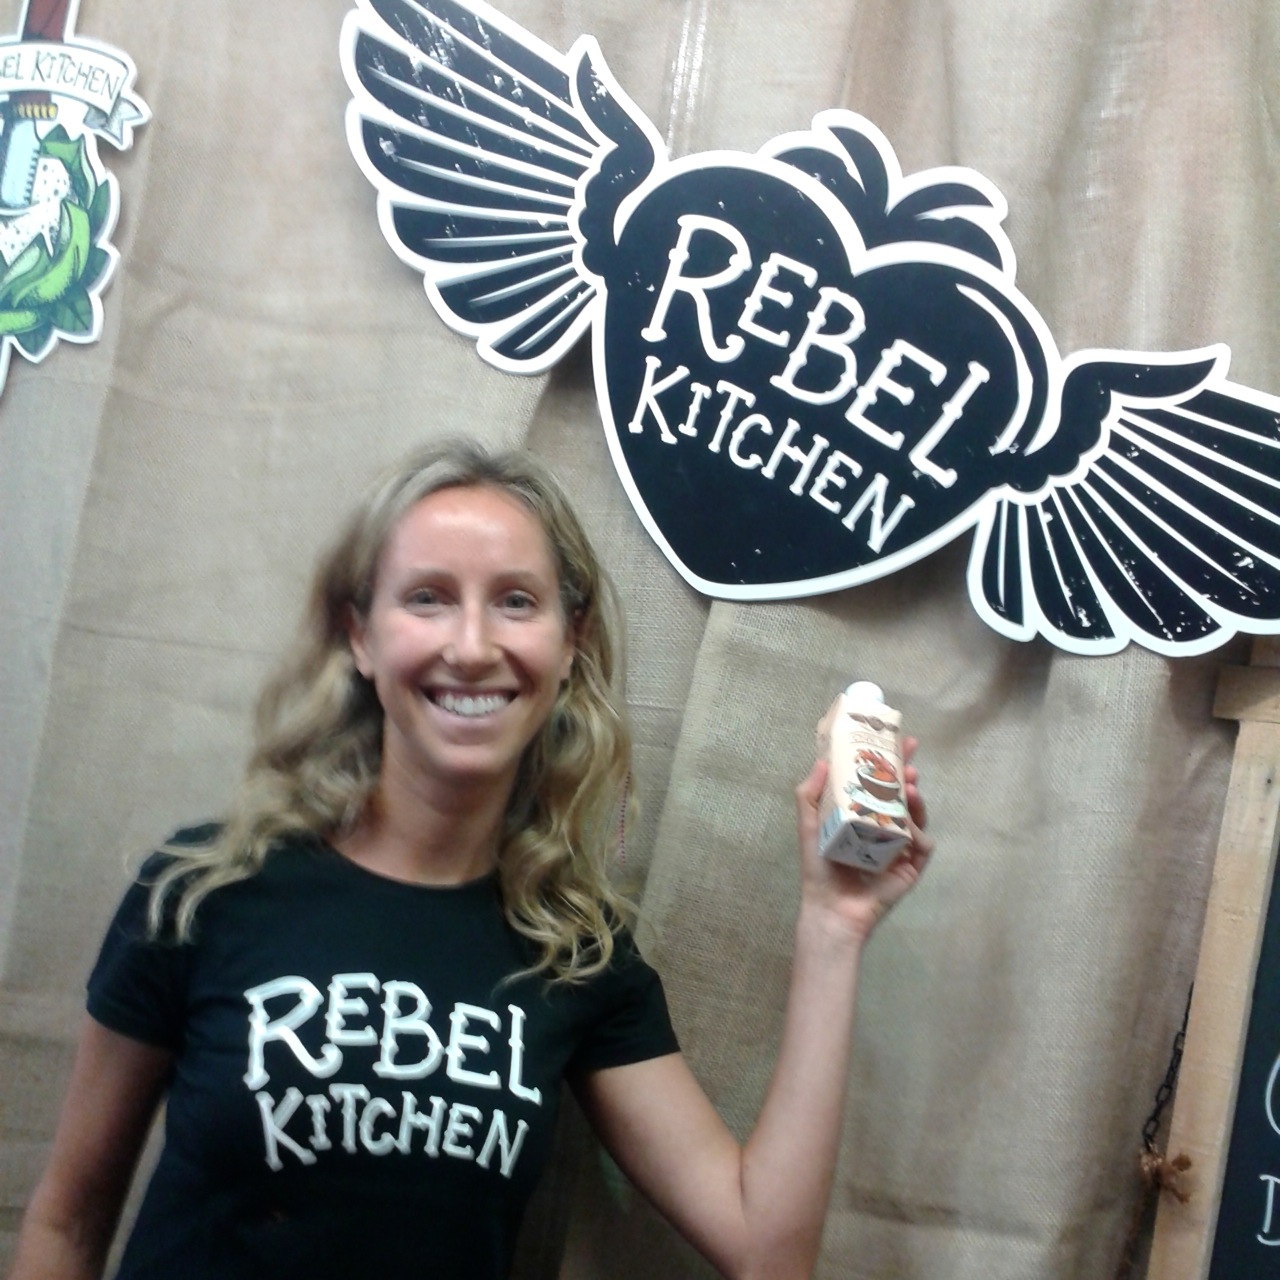 http://fatgayvegan.com/wp-content/uploads/2014/09/rebel-kitchen.jpg